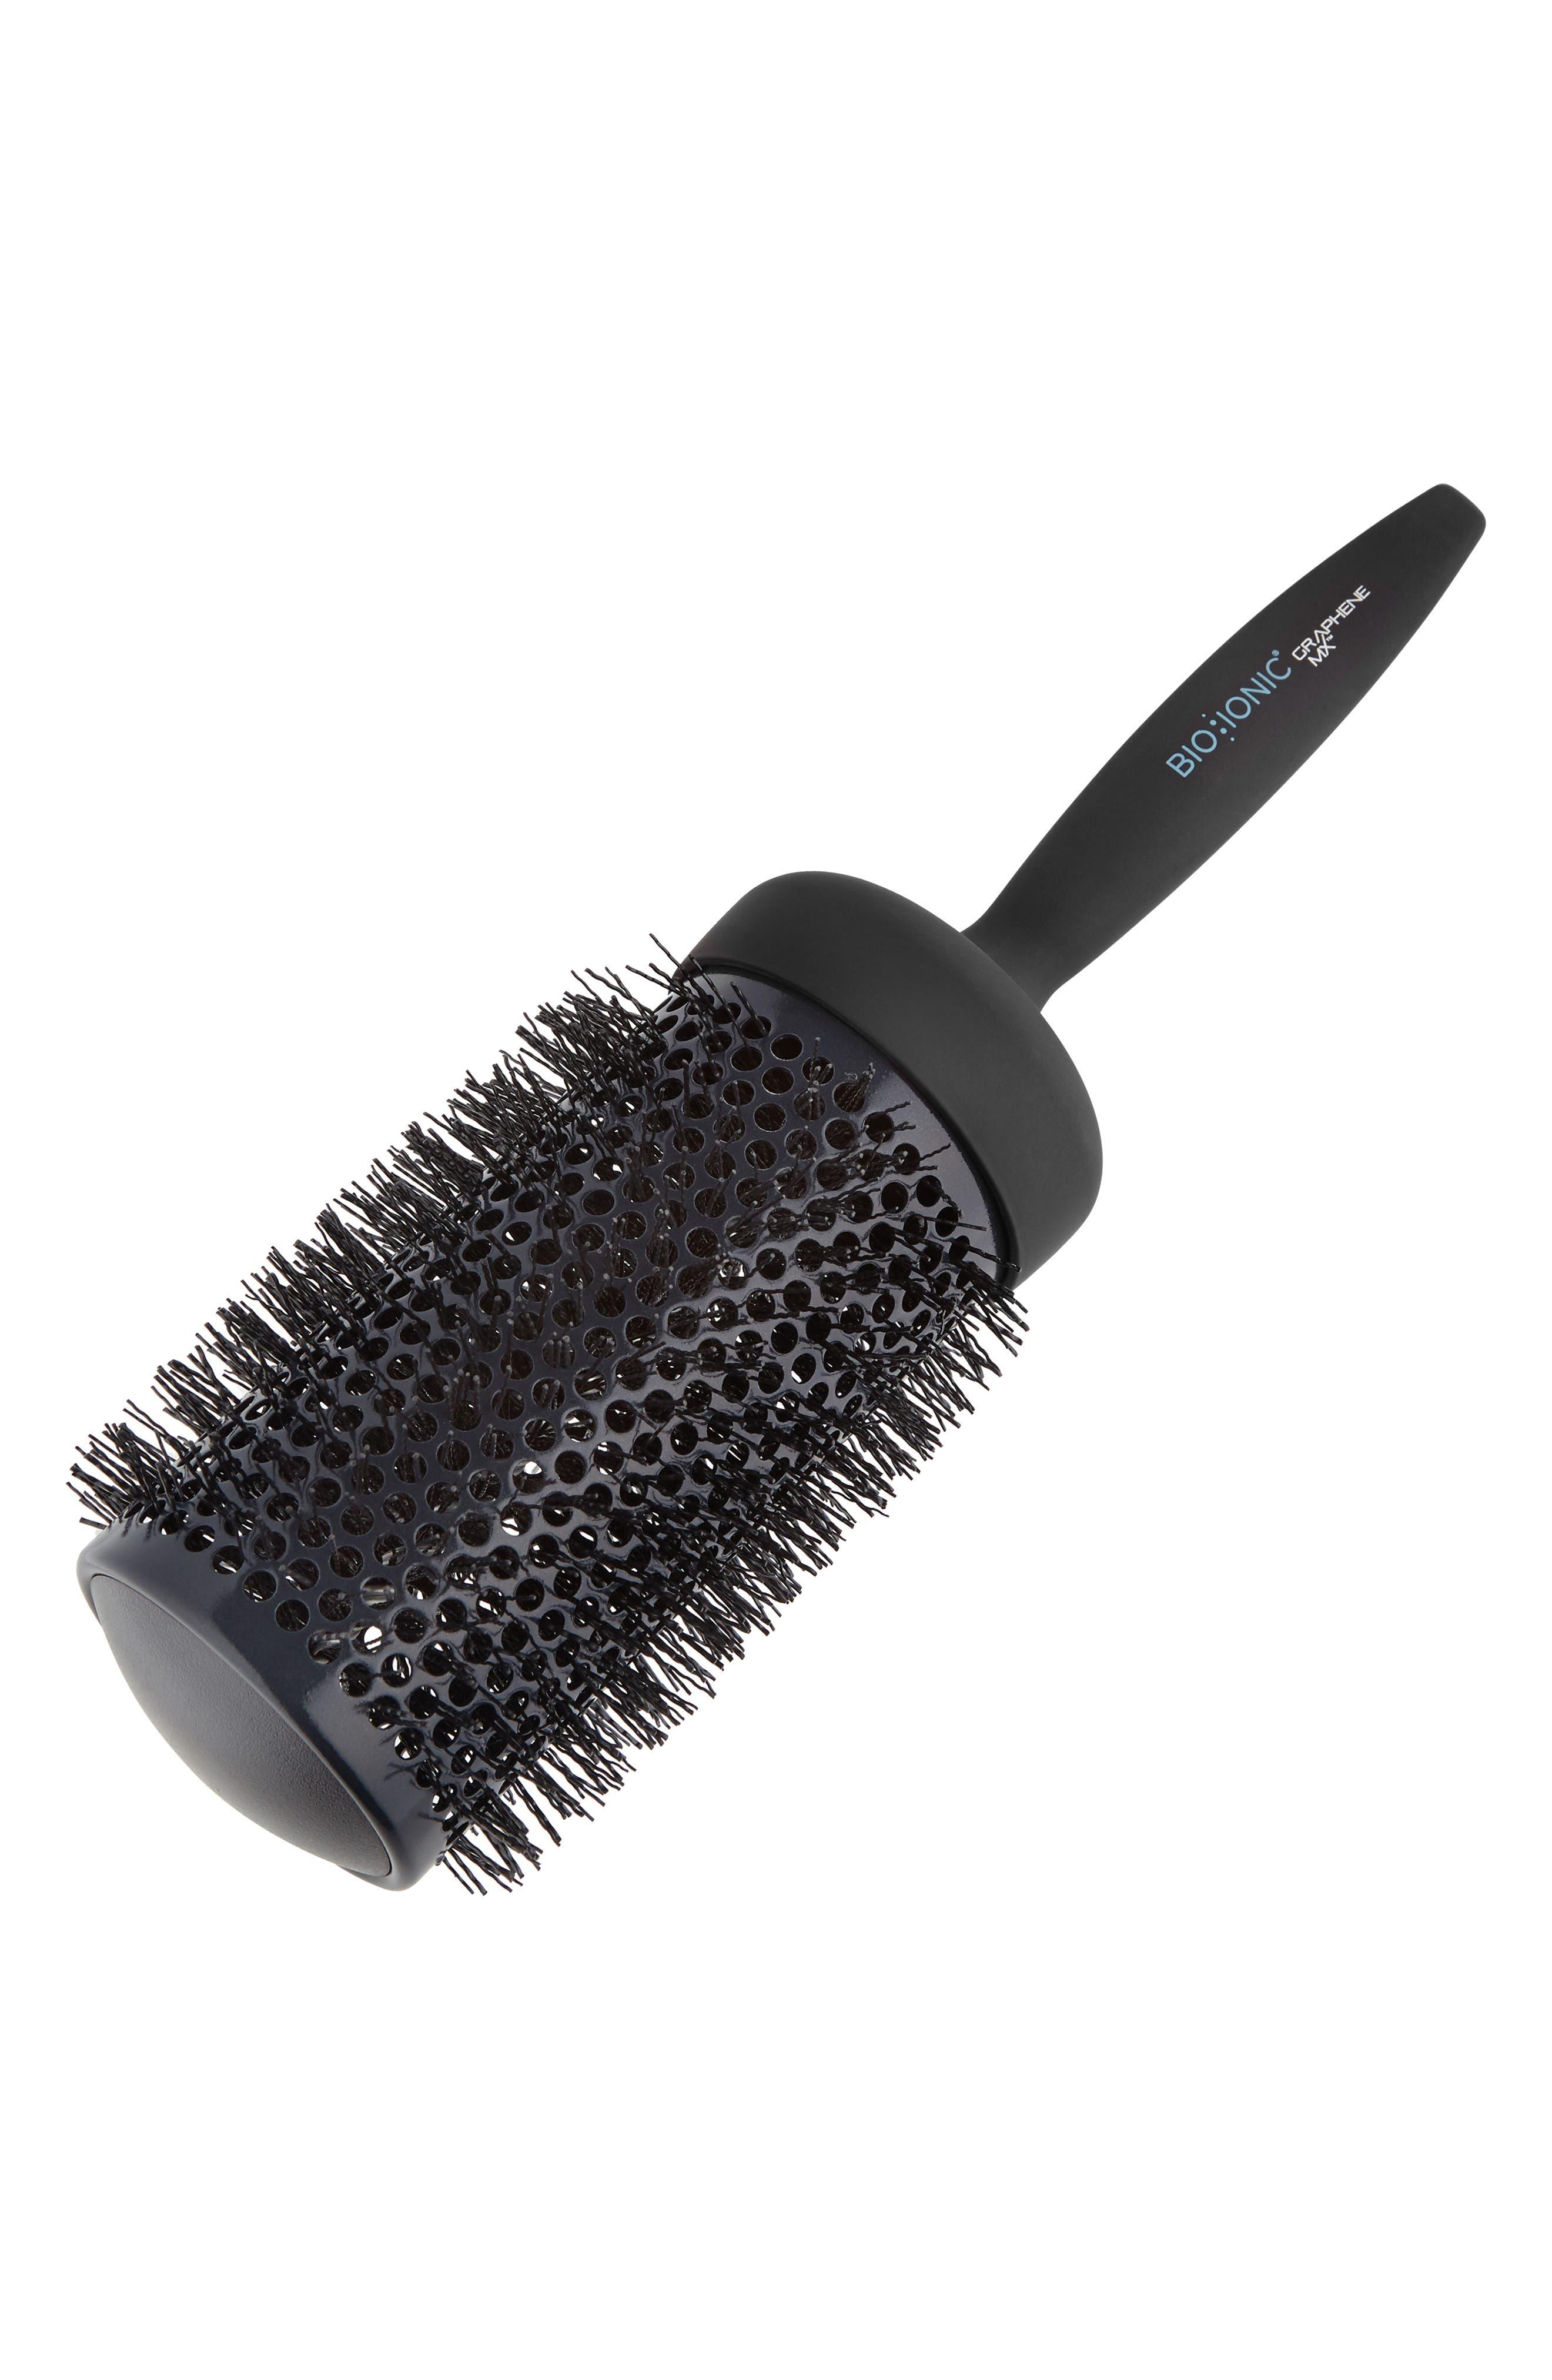 65mm Graphenemx Thermal Styling Brush